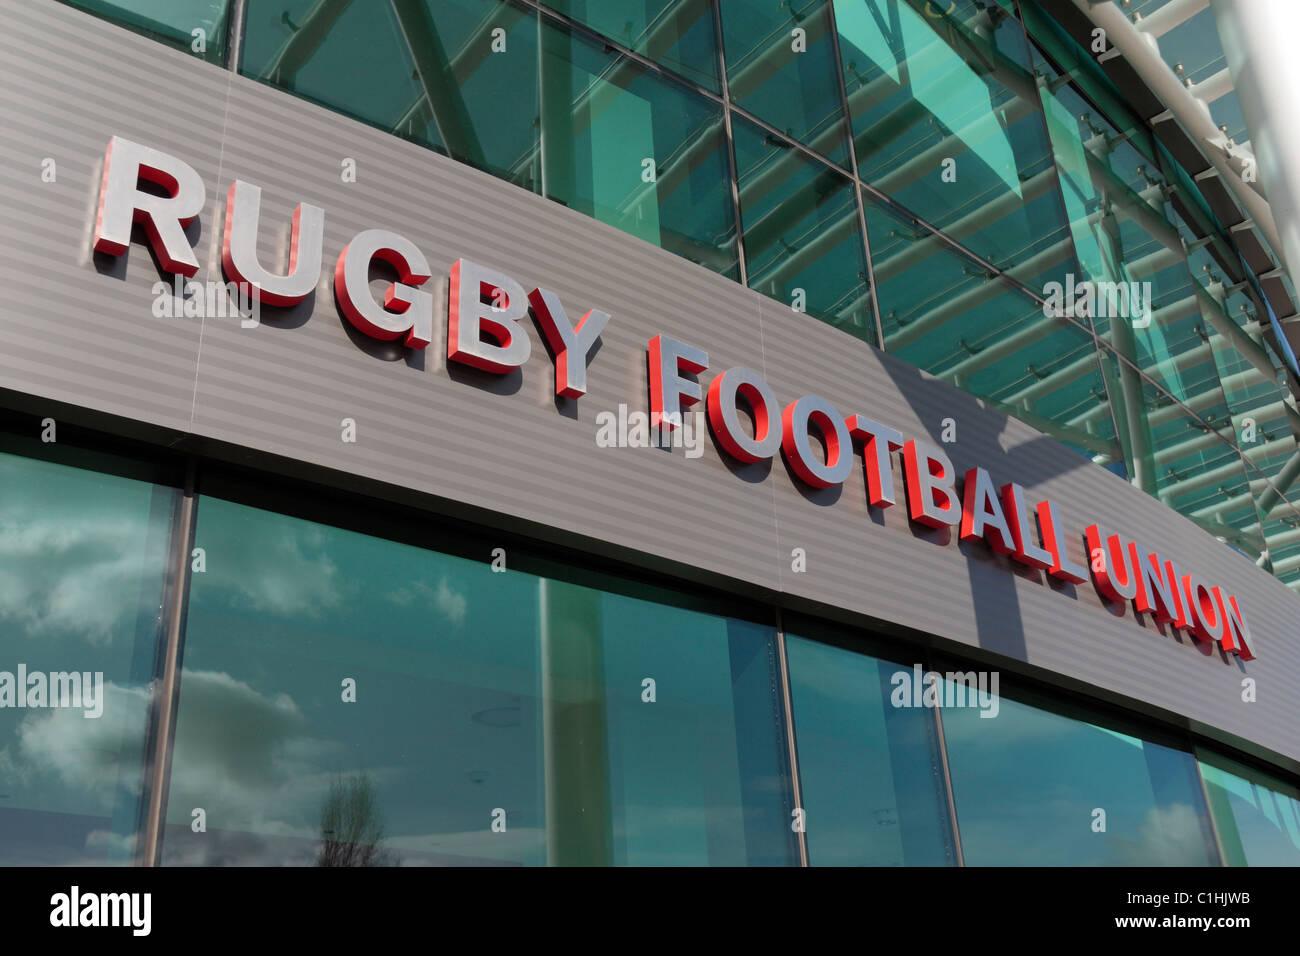 'Rugby Football Union' sign outside Twickenham Rugby Stadium, London, UK. - Stock Image